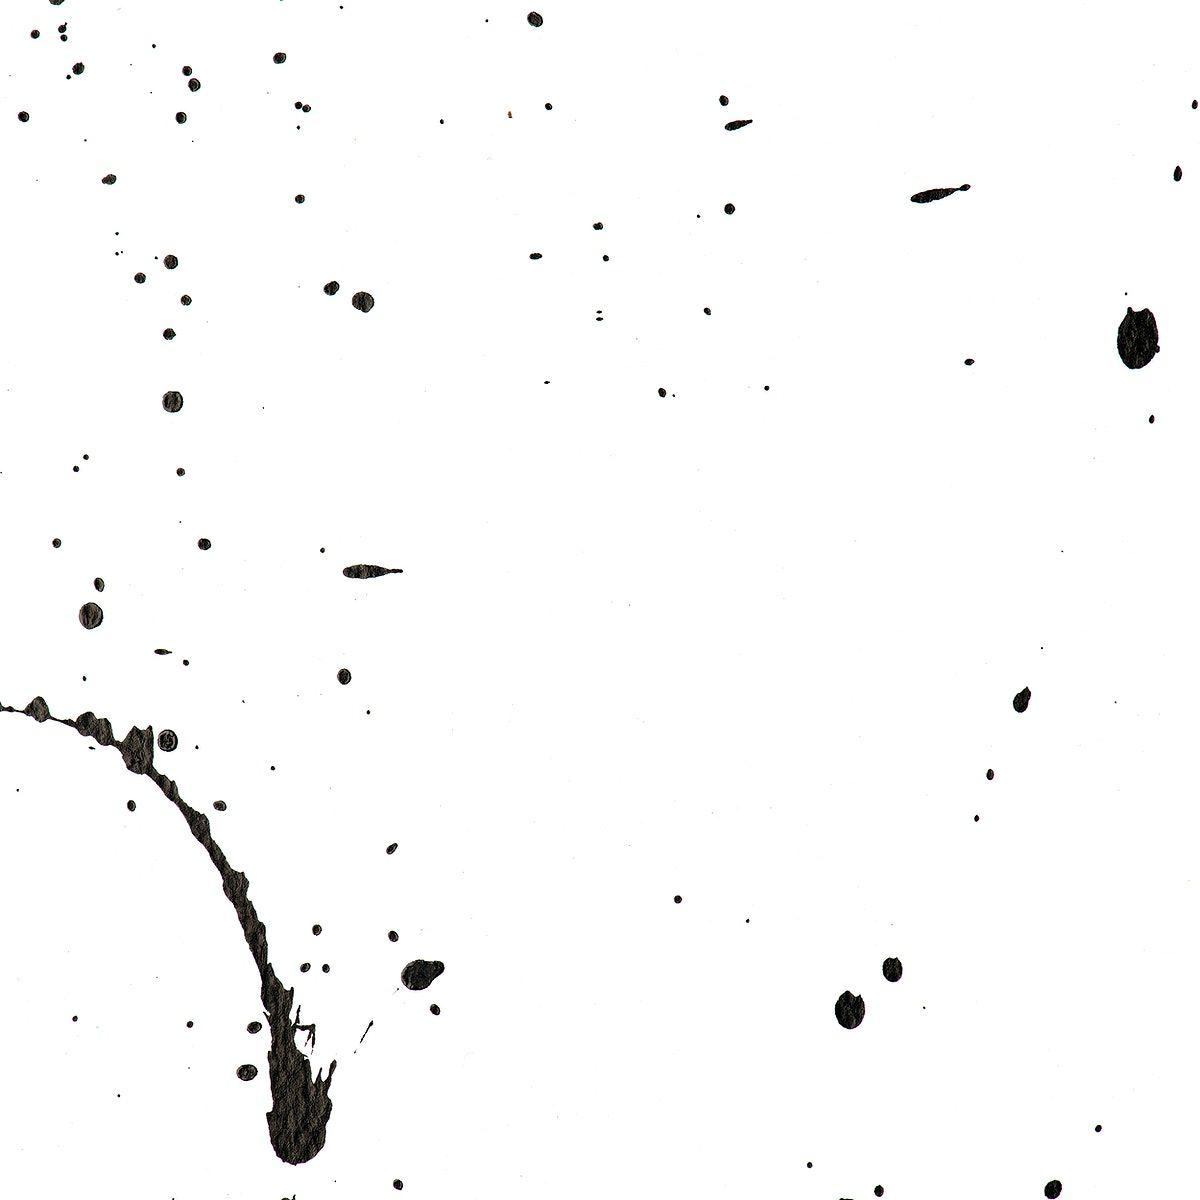 Black Ink Drop Texture Background Free Image By Rawpixel Com Tana Textured Background Background Image